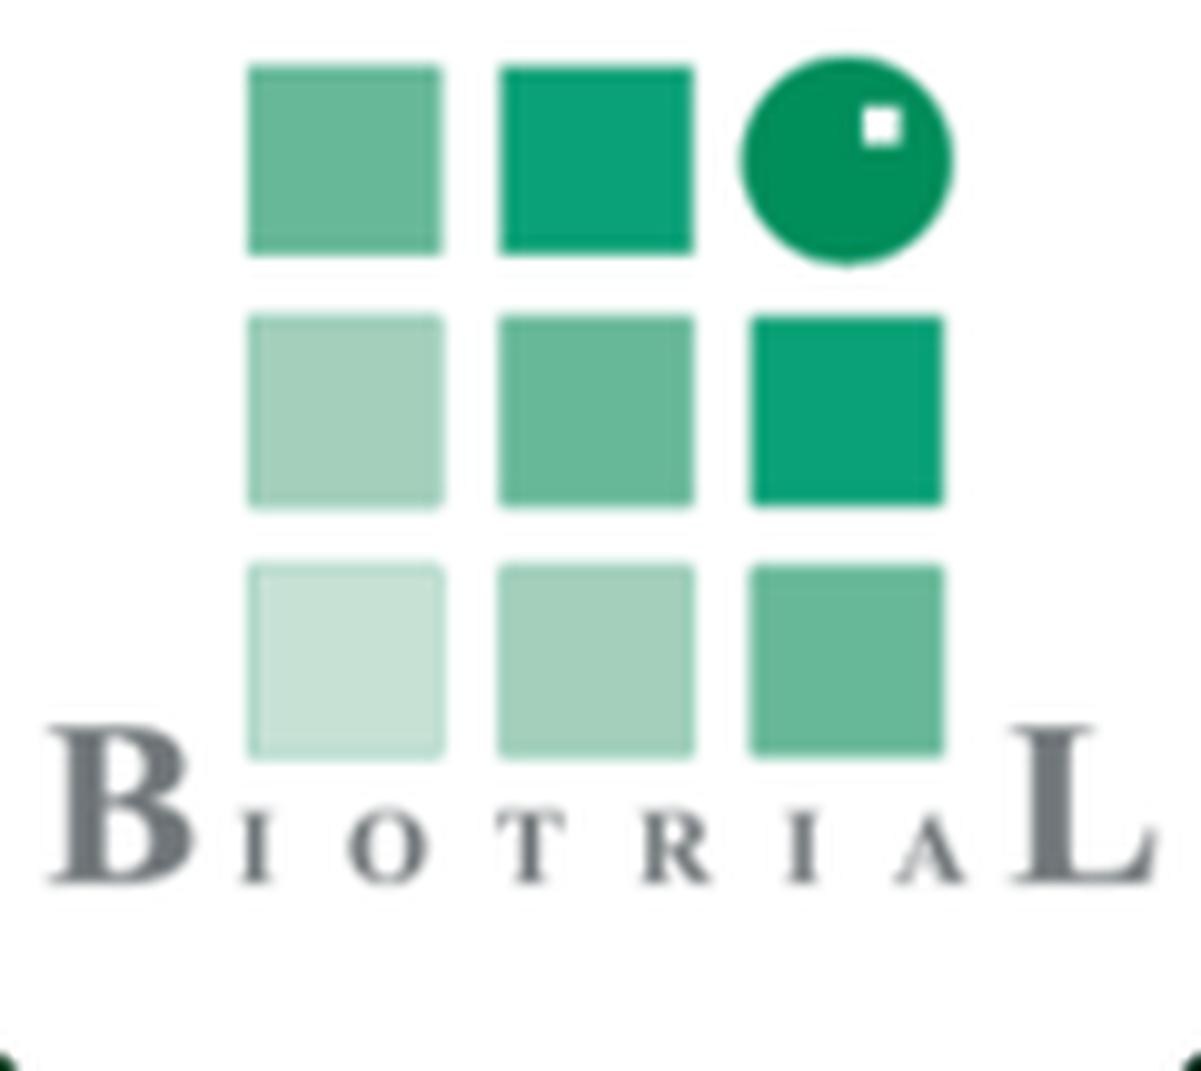 Biotrial | Wiki & Review | Everipedia